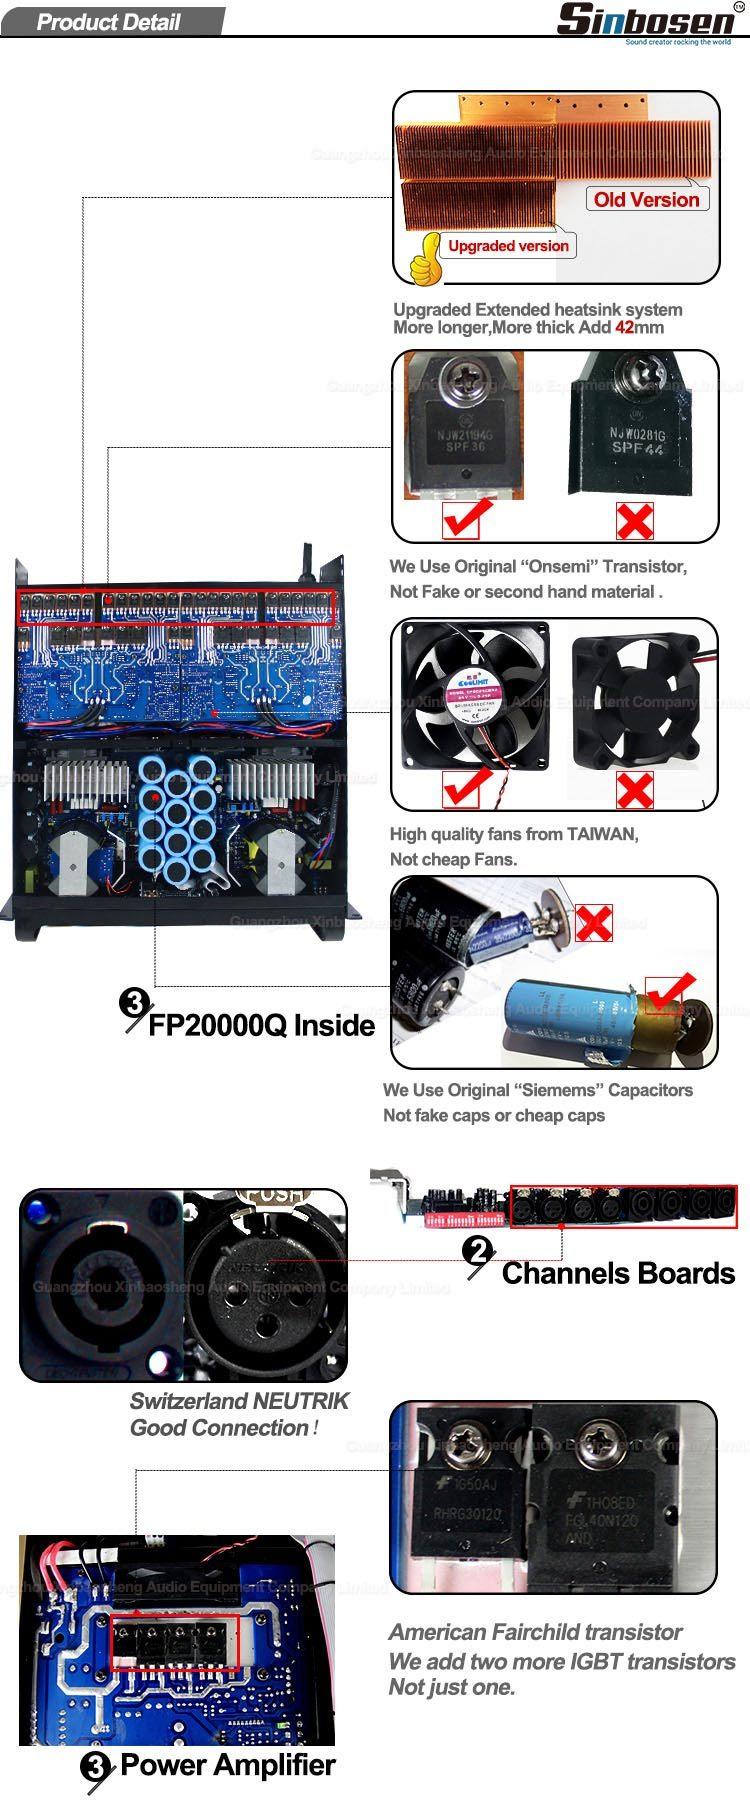 FP20000Q Leistungsverstärker